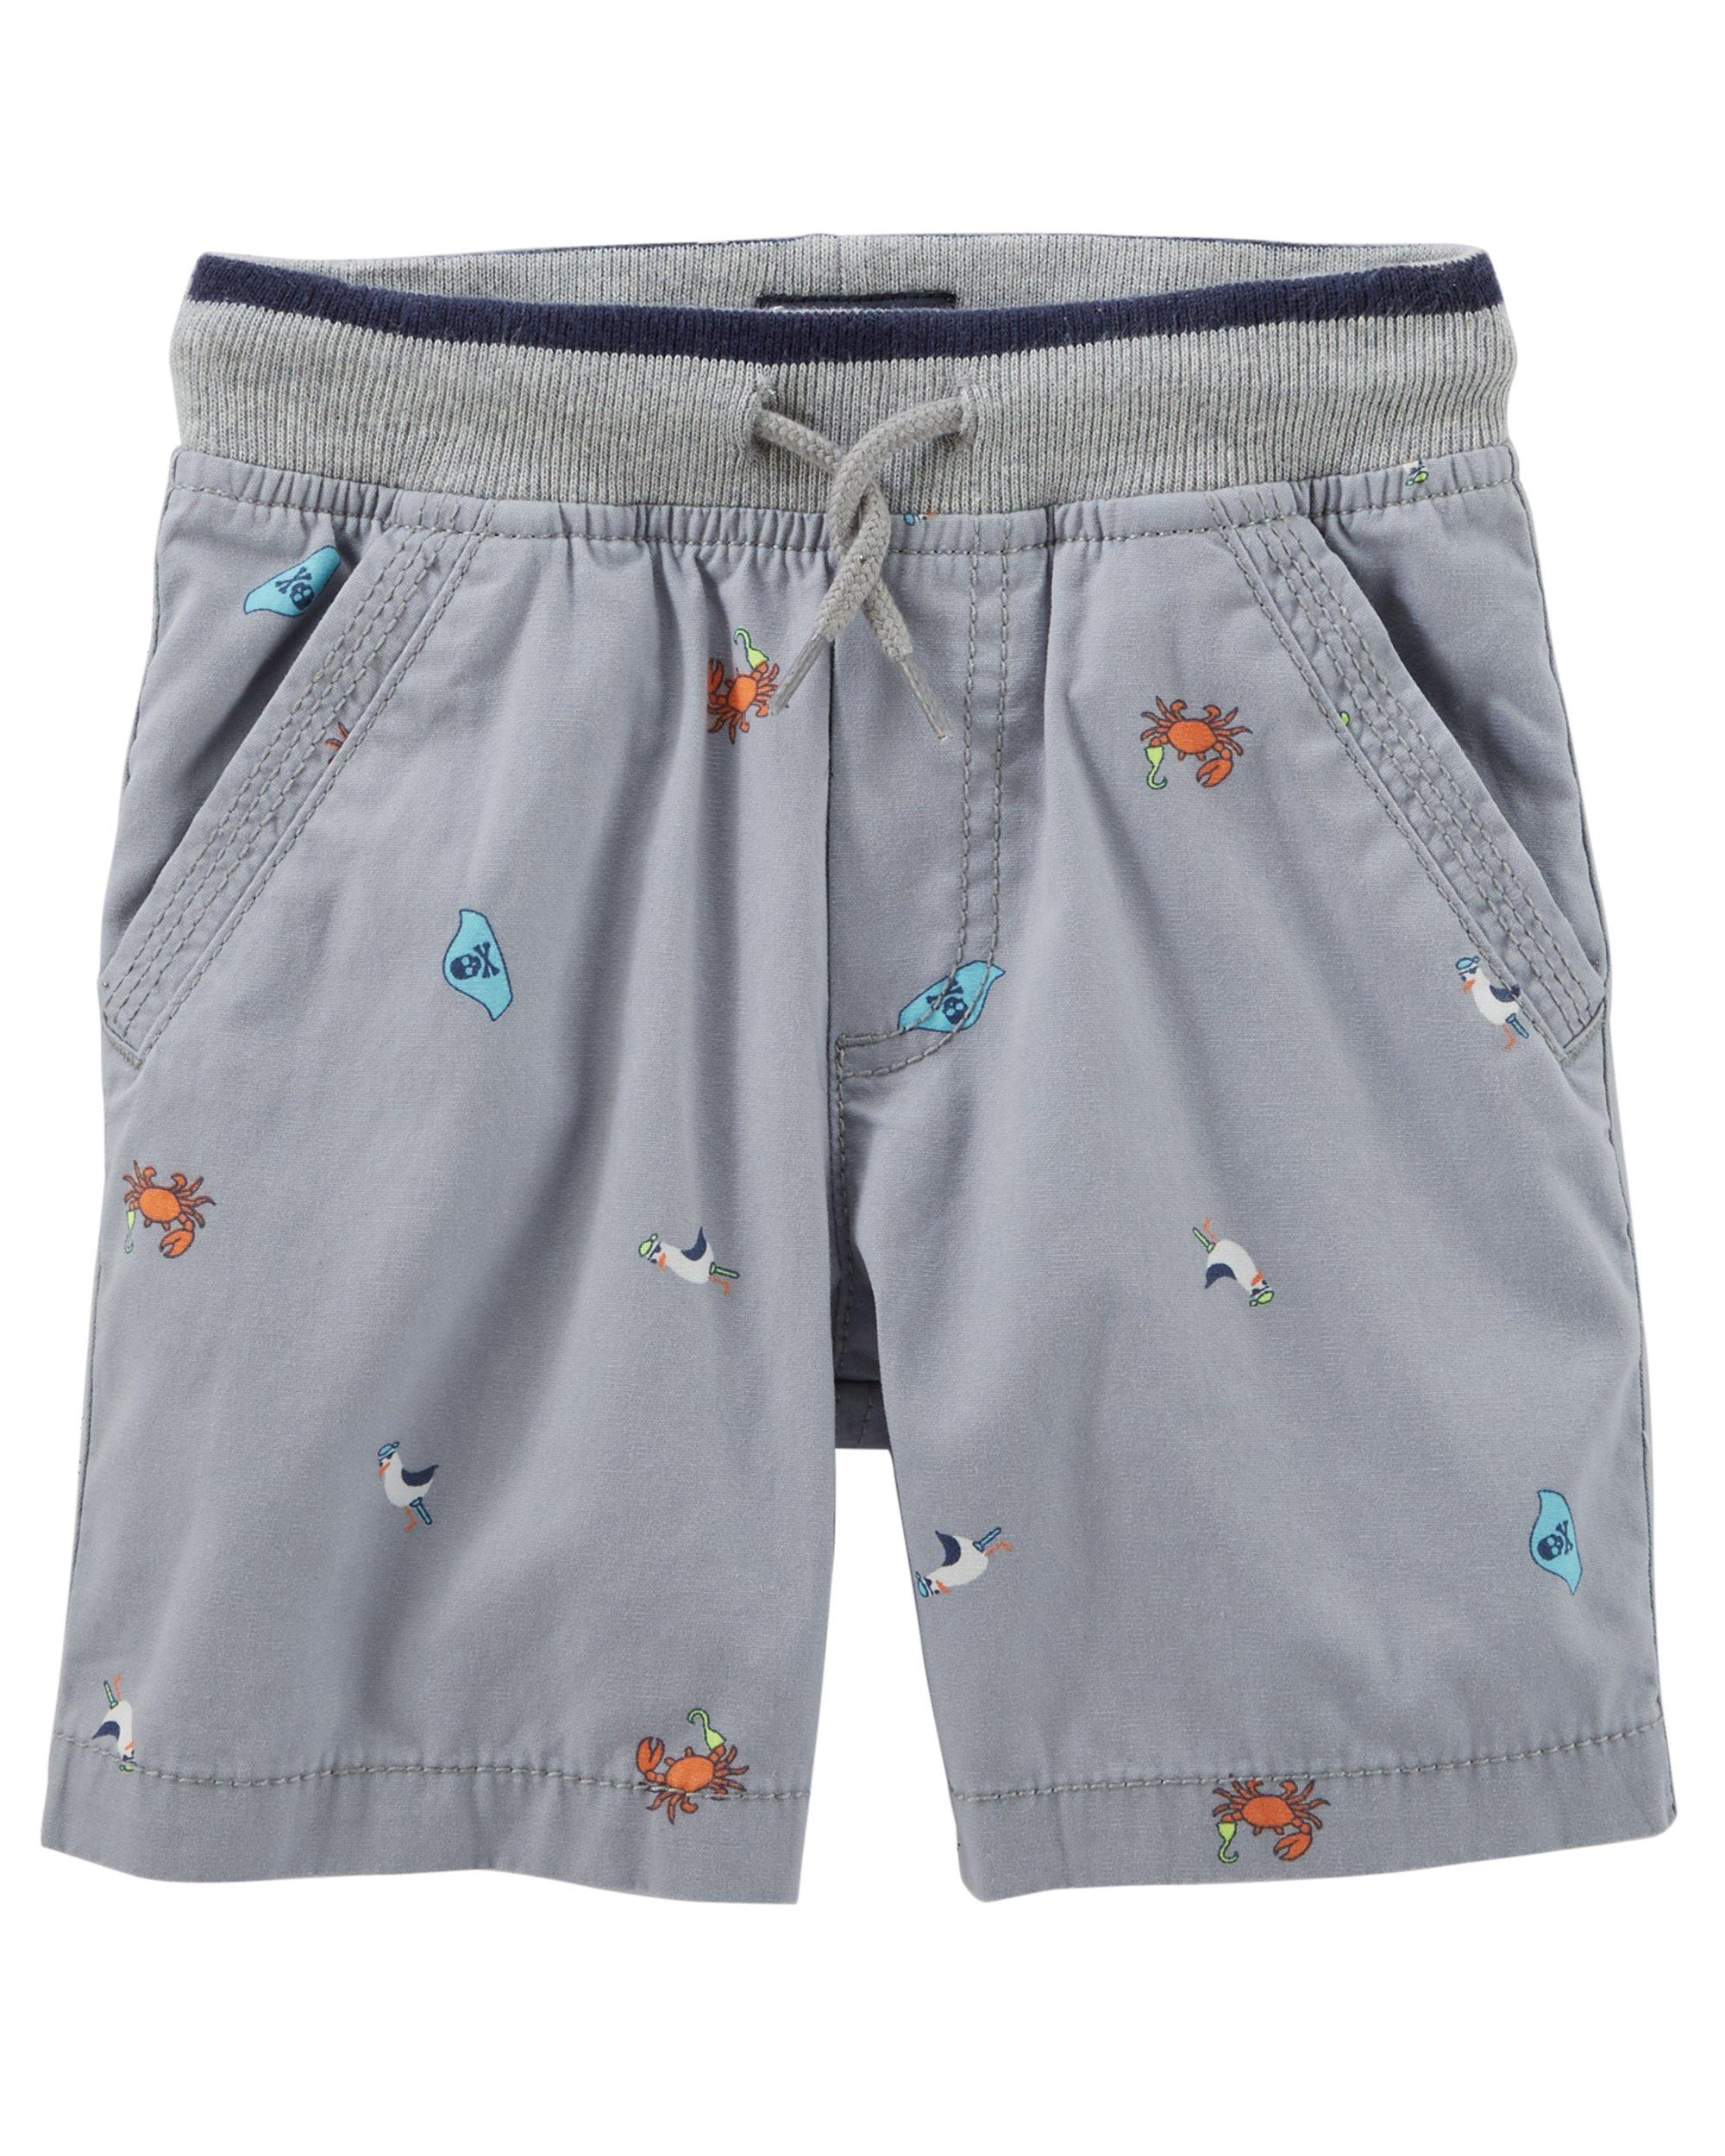 Osh Kosh Boys' Toddler Pull on Short, Grey Schiffli, 3T